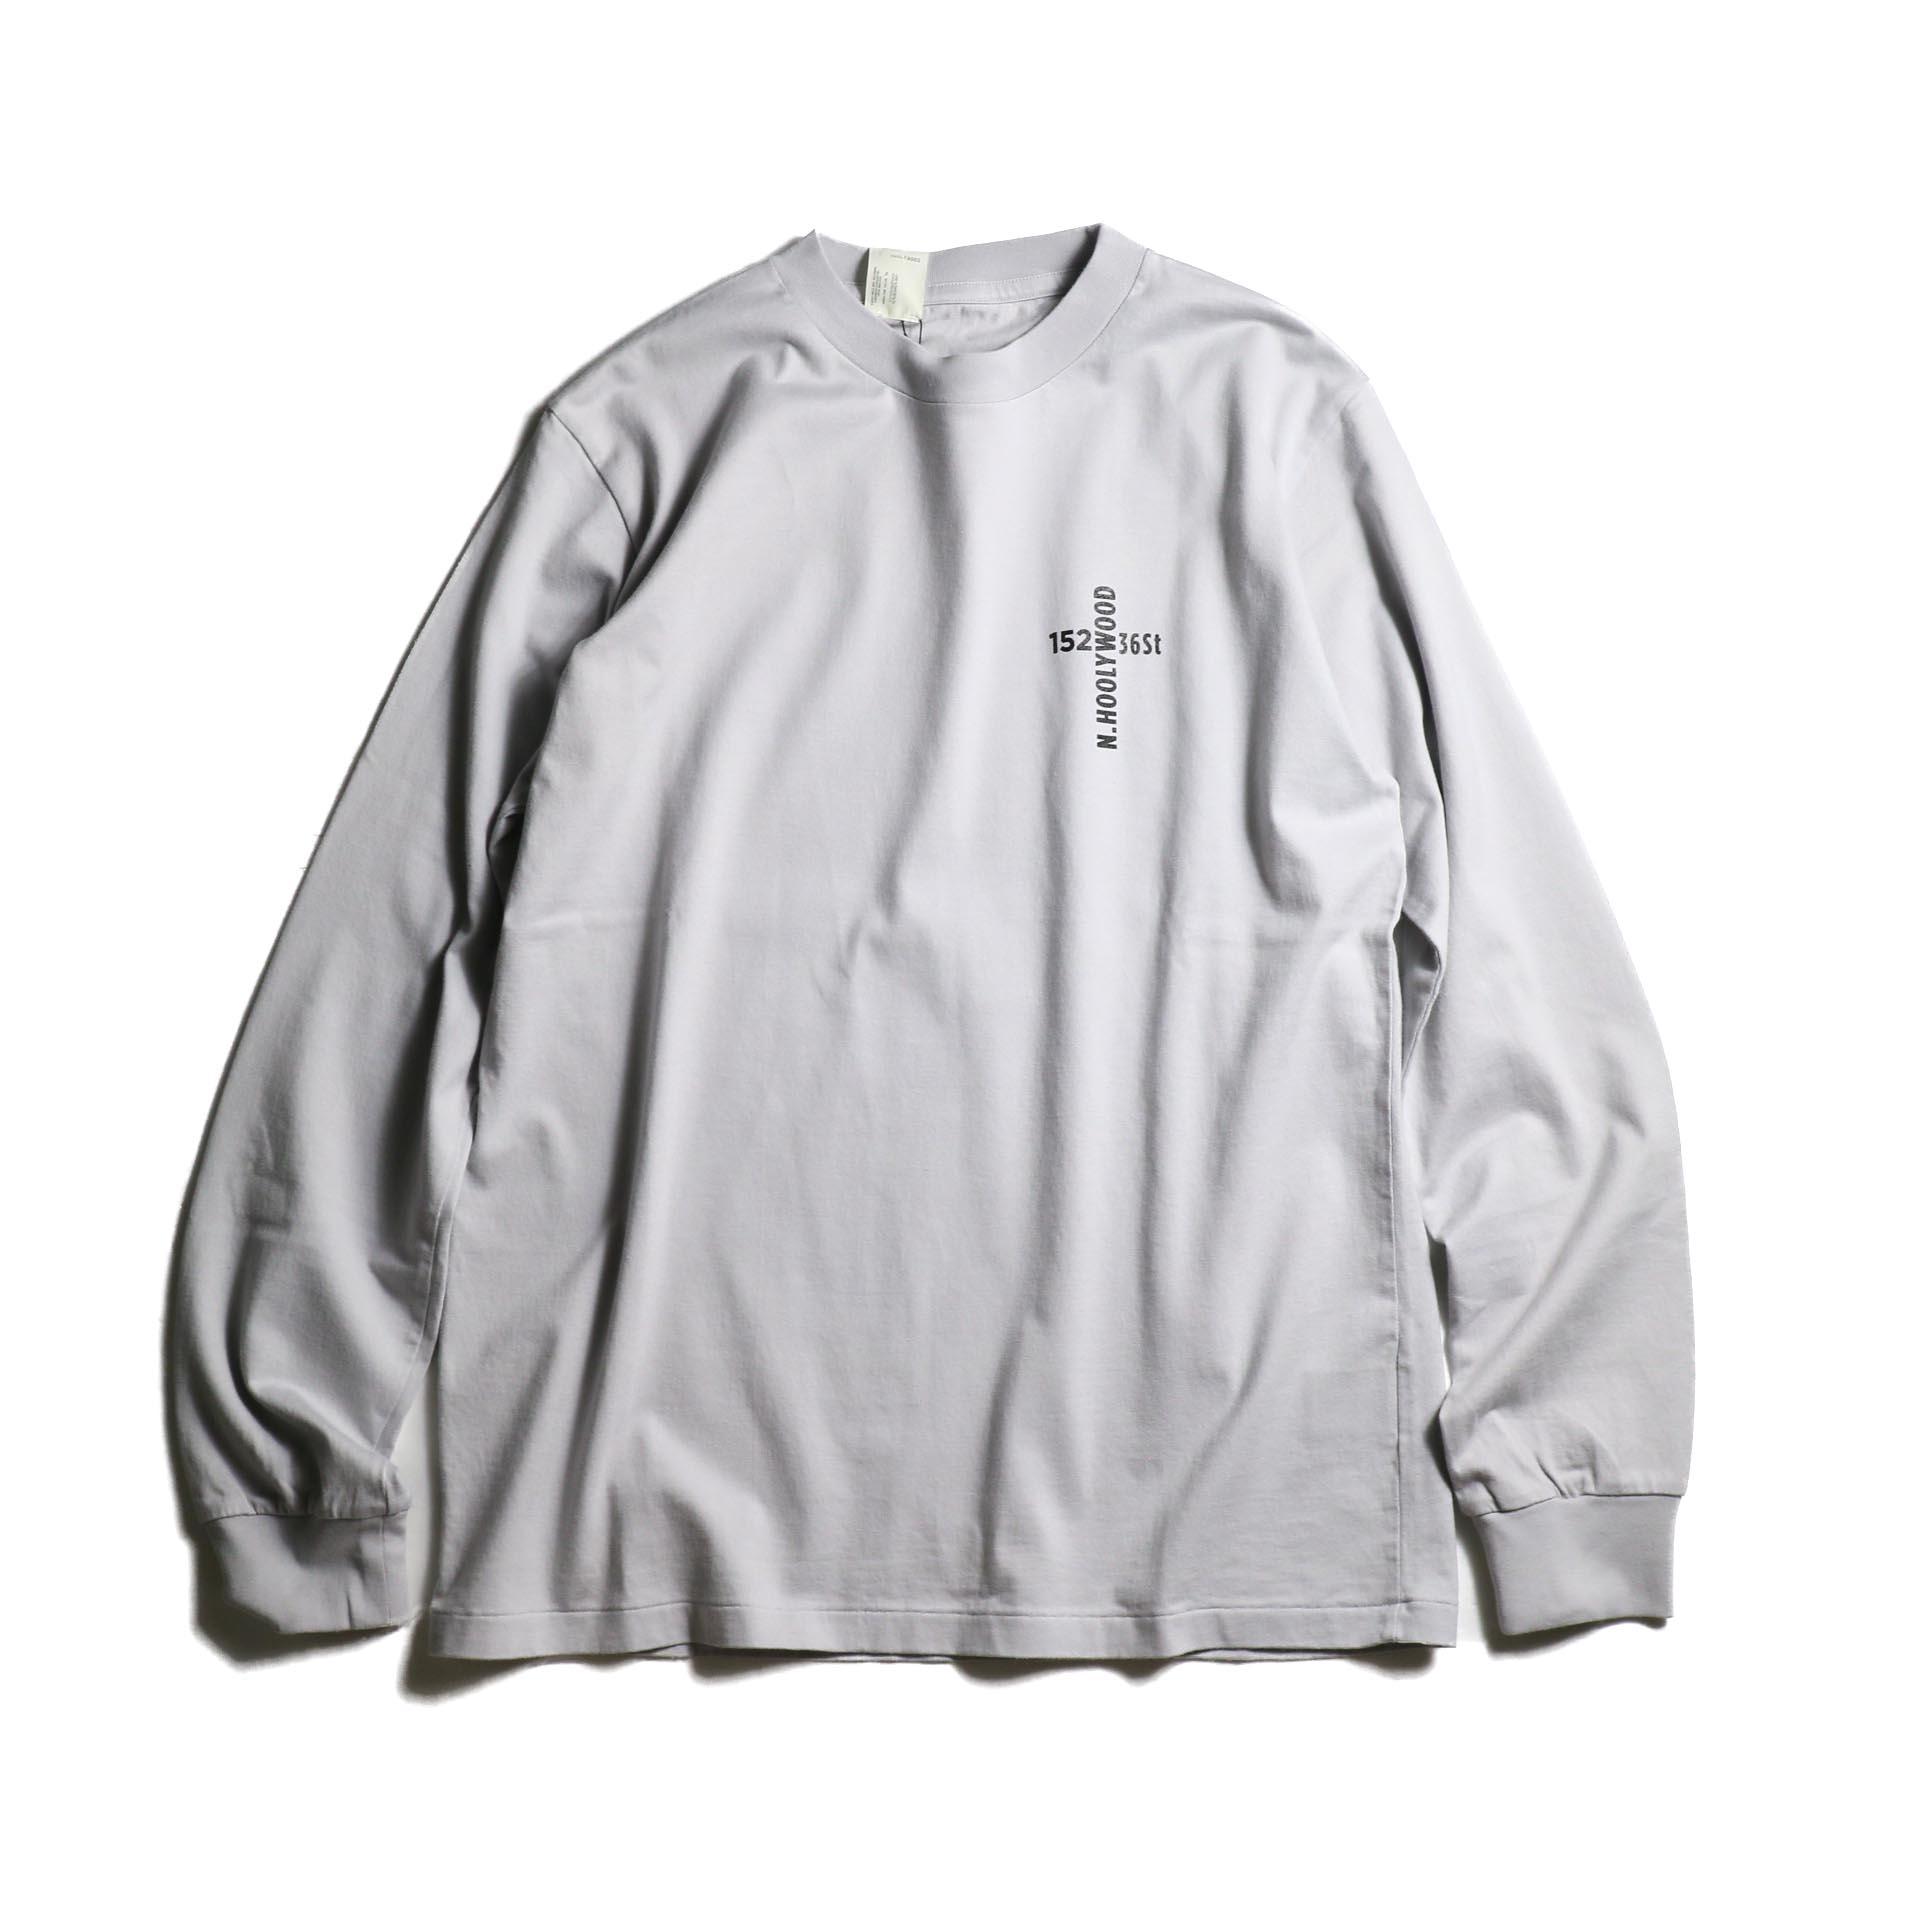 N.HOOLYWOOD / 1201-CS33-079 Long Sleeve Shirt (L.Gray)